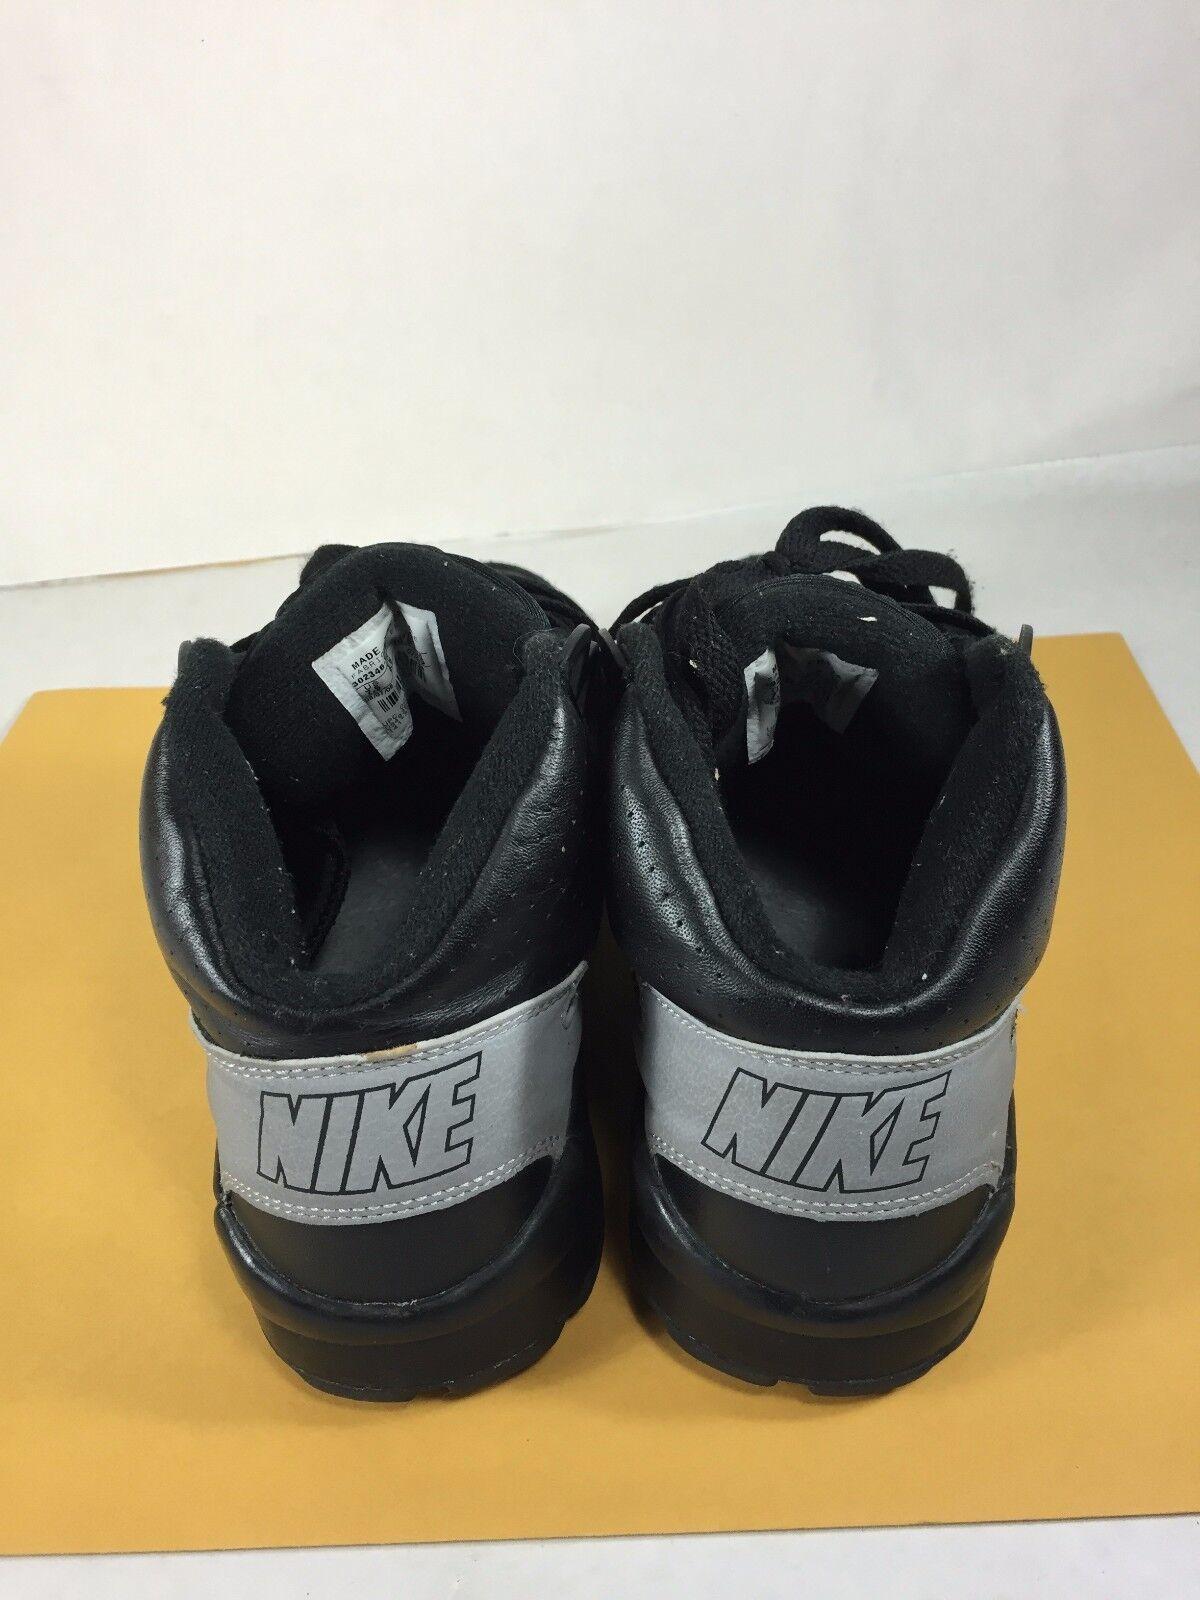 2006 nike air / trainer sc hi nero / air nero stealth - scarpe 302346-002 - größe 7,5 886810